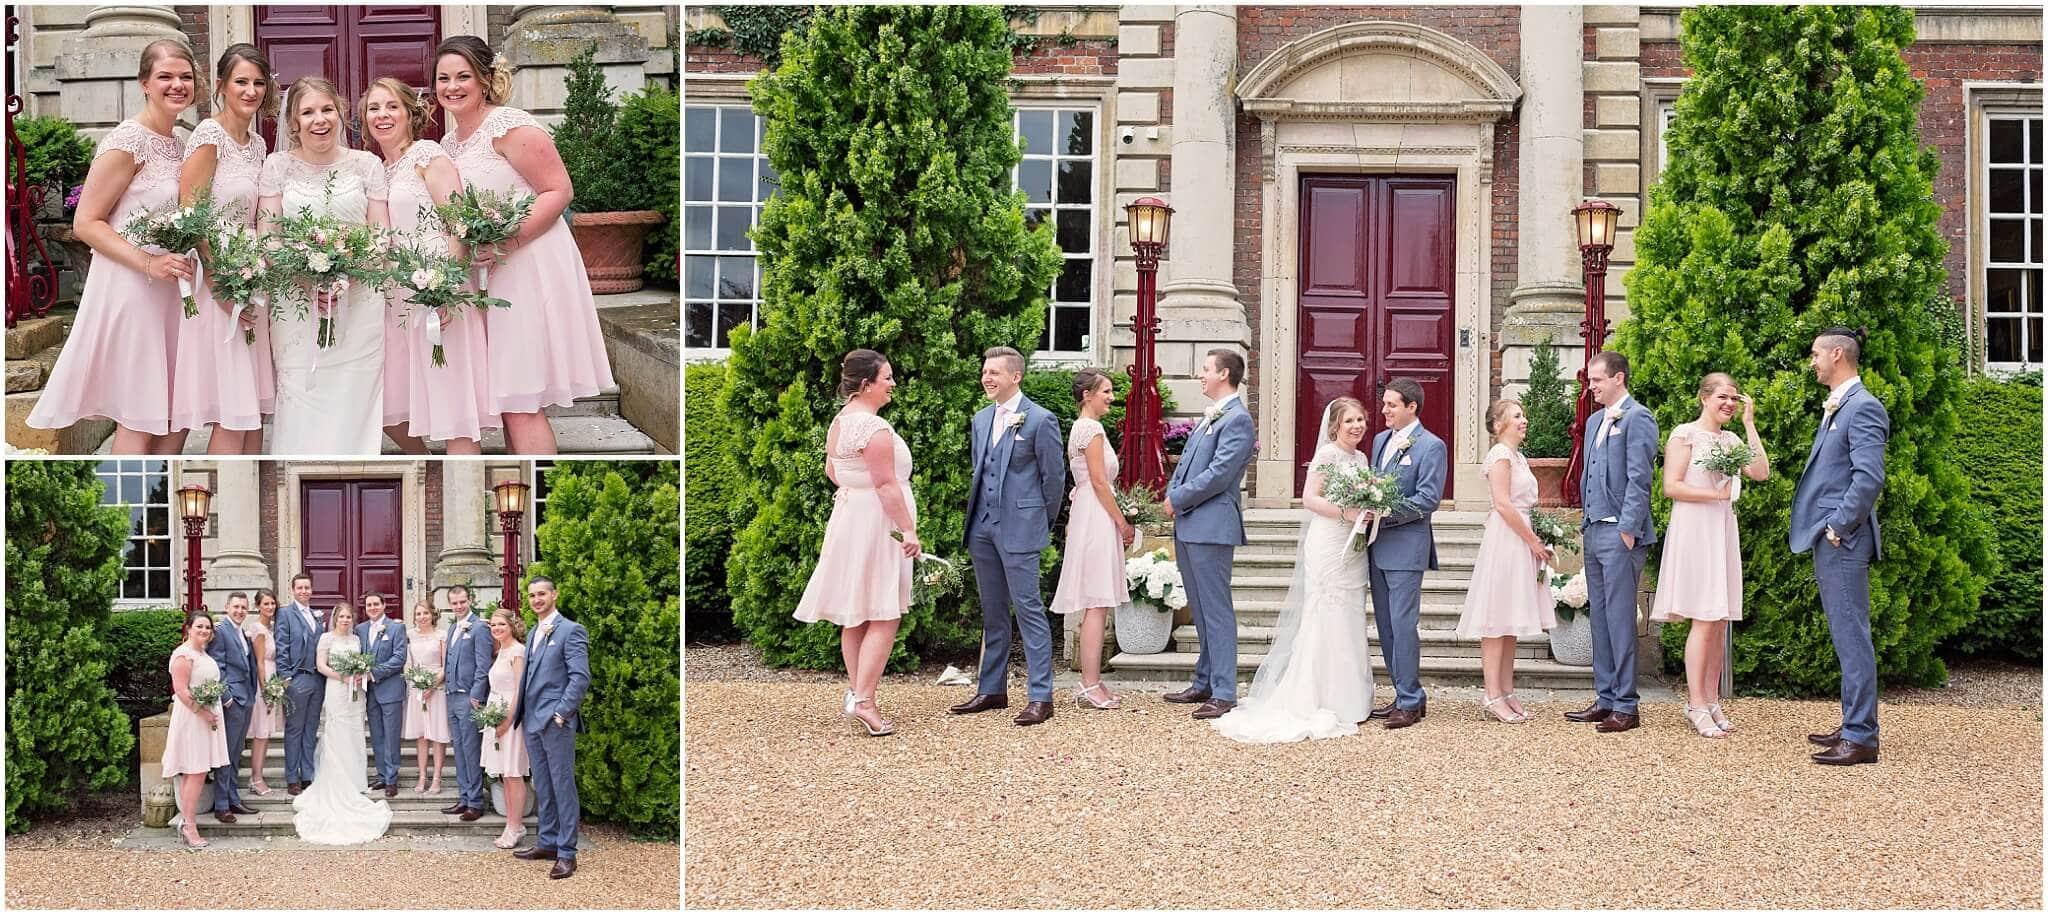 Cambridge Wedding Photographer at Anstey Hall